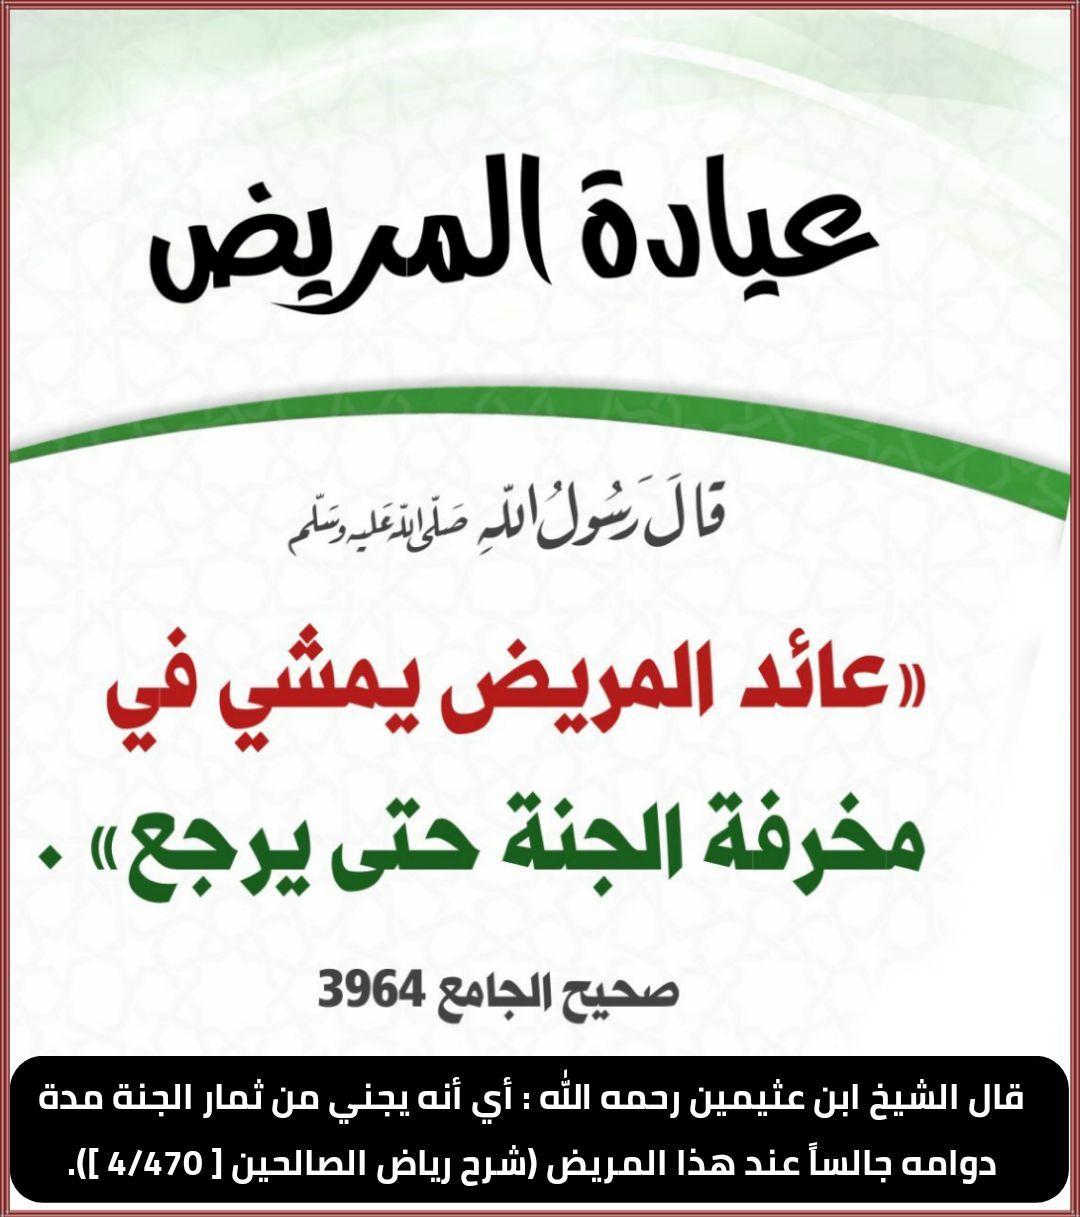 Pin By الأثر الجميل On أحاديث نبوية Quran Quotes Islamic Quotes Salaah